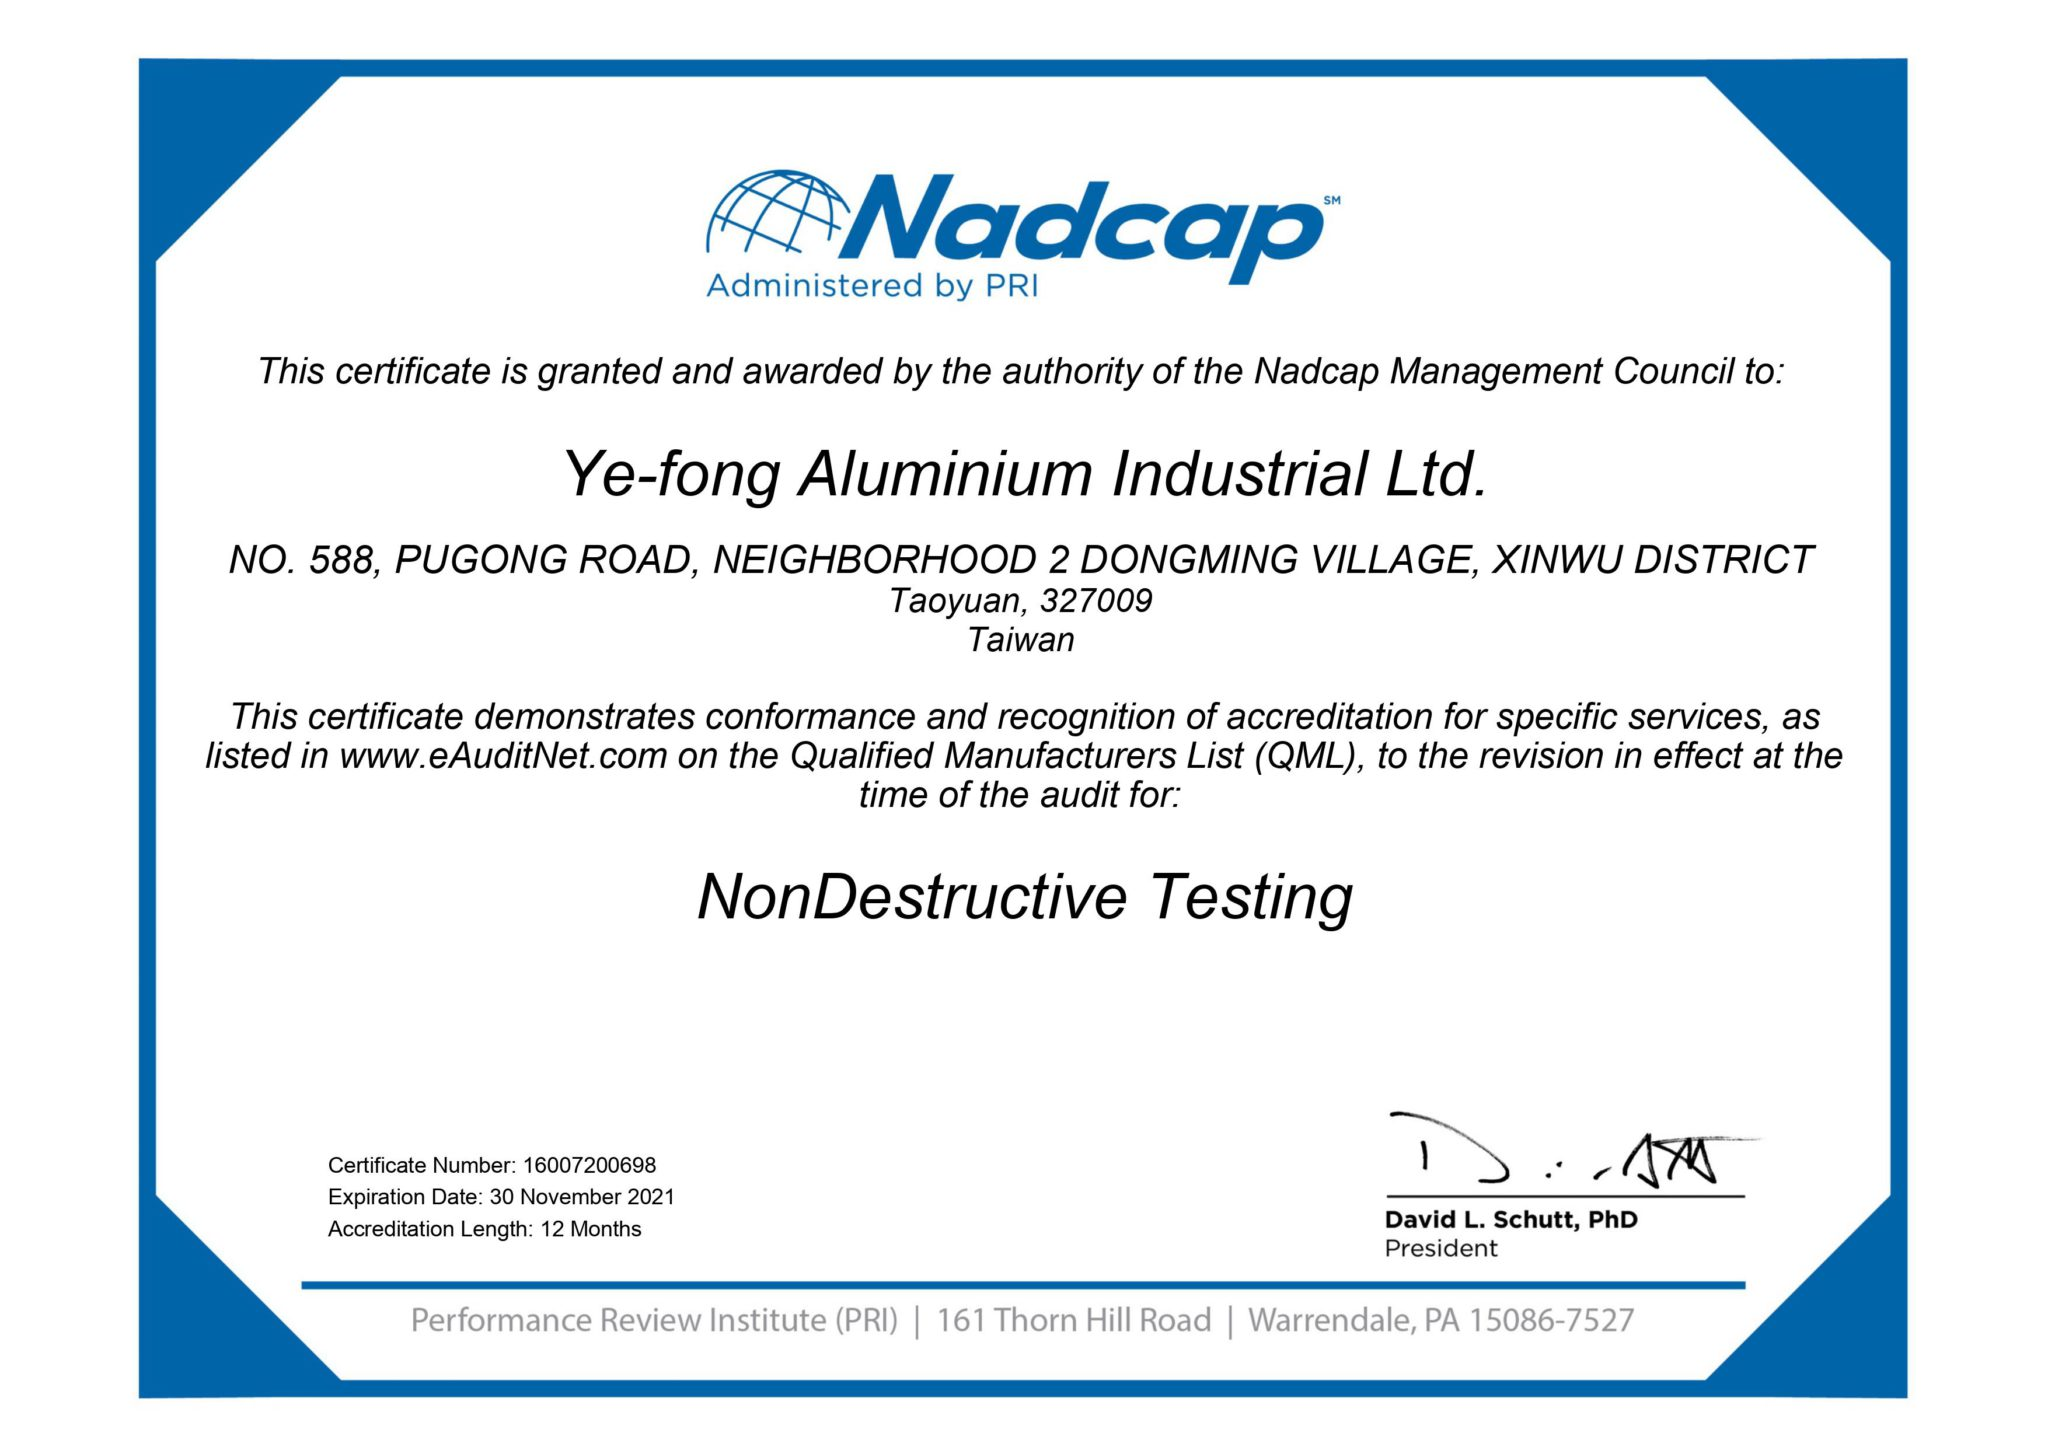 https://www.ye-fong.com/wp-content/uploads/2020/06/NADCAP-NonDestructive-Testing.pdf